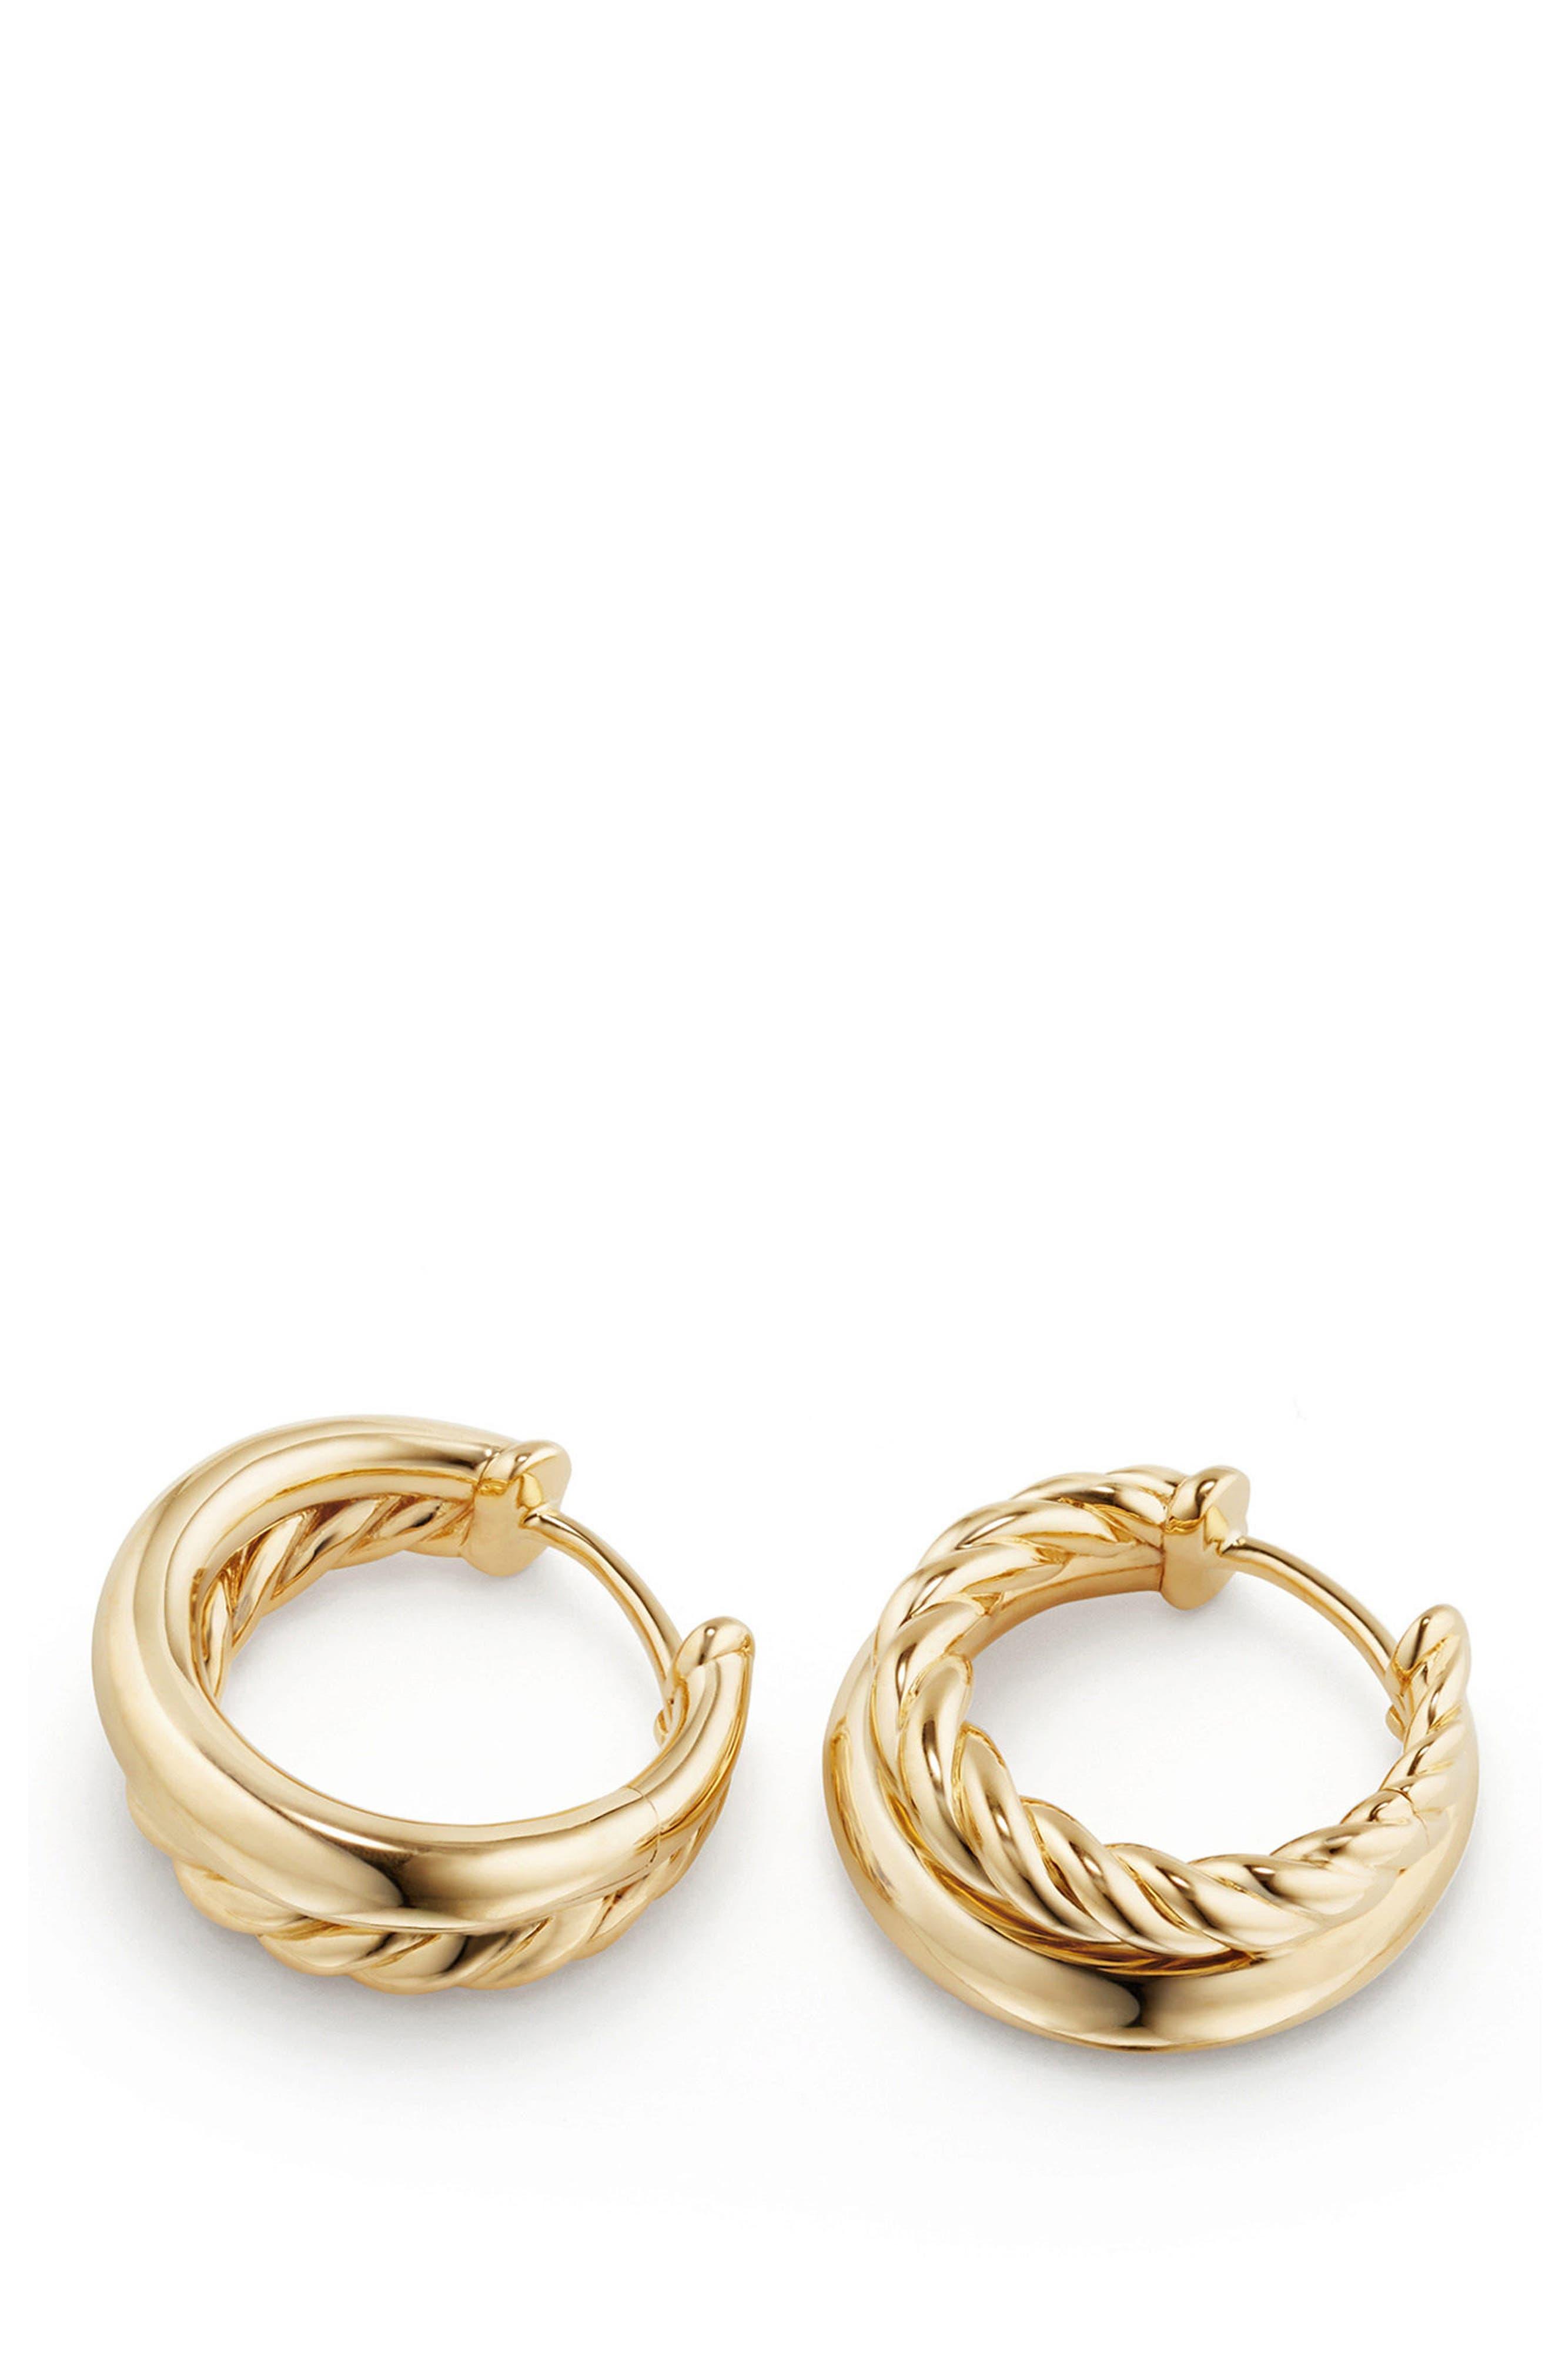 Alternate Image 2  - David Yurman Pure Form Hoop Earrings in 18K Gold, 12mm